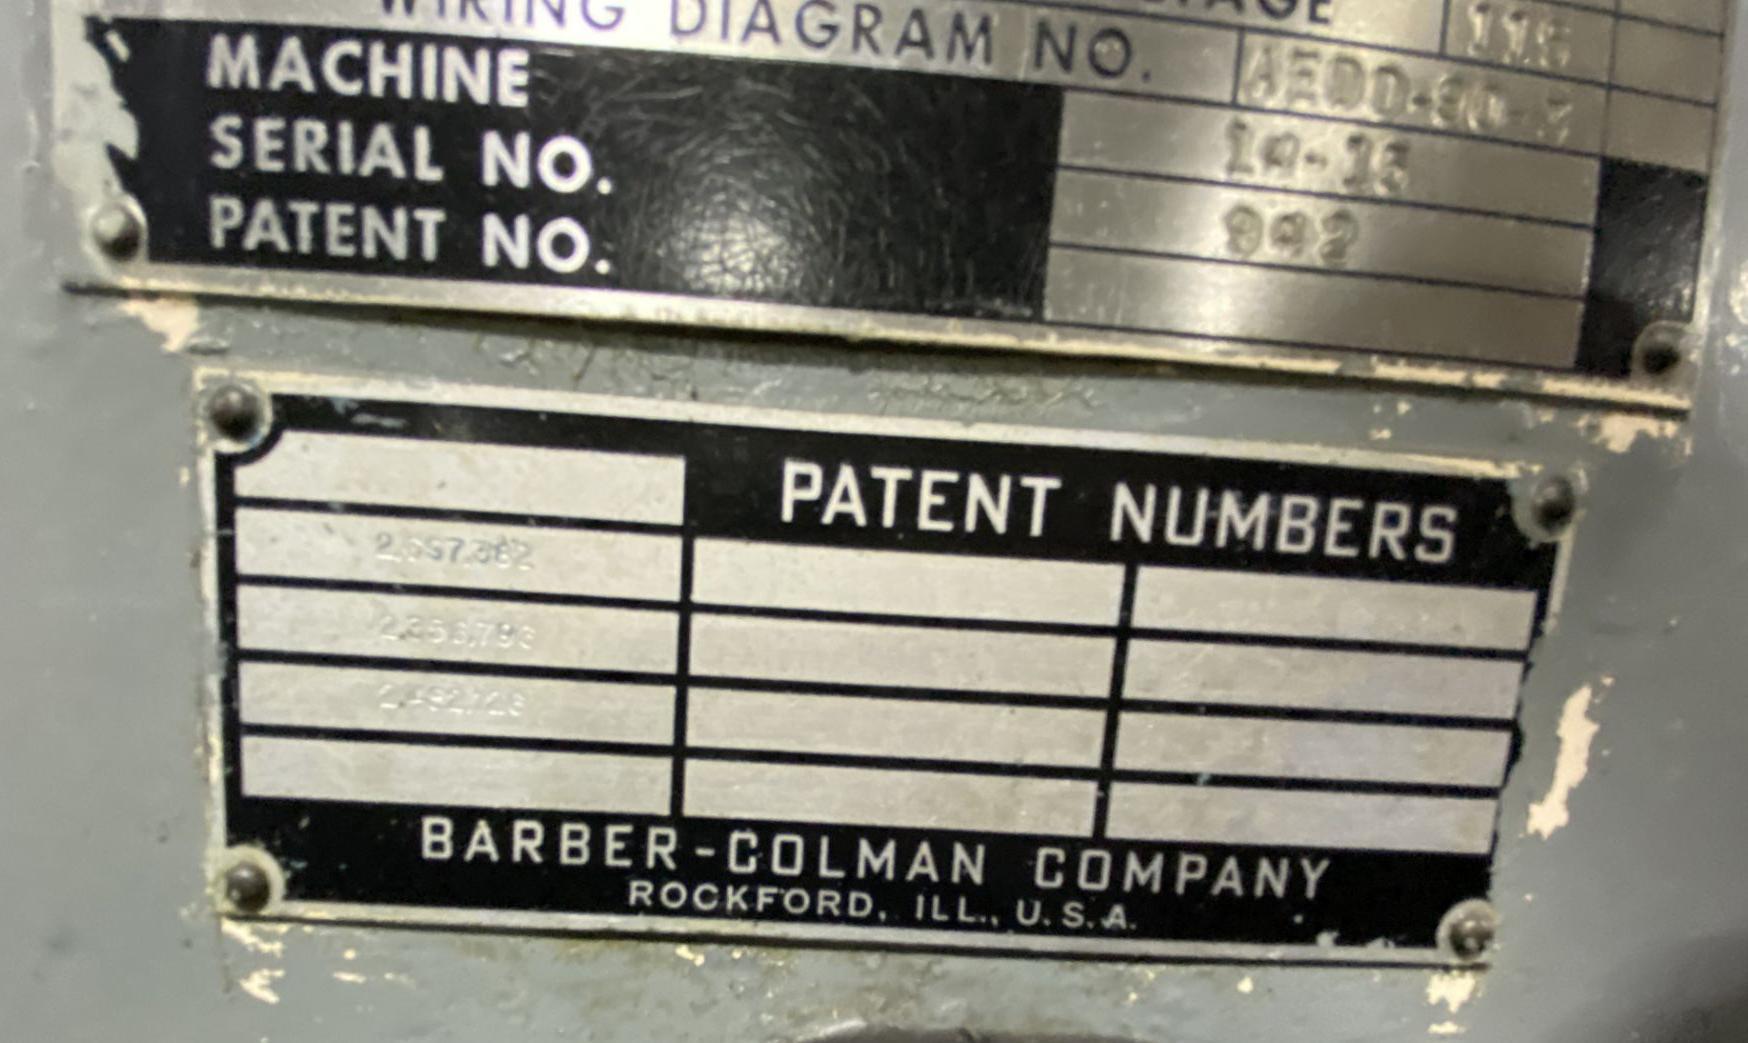 "14-15 BARBER COLMAN HORIZONTAL GEAR HOBBER, 14"" Max Work Diameter, 15"" Max Hob Slide Travel, 6.25"" Max Hob Diameter, Auto Hob Shift, Auto 2-Cut Cycle, Hydraulic Workhead, Hydraulic & Coolant System, New 1963."